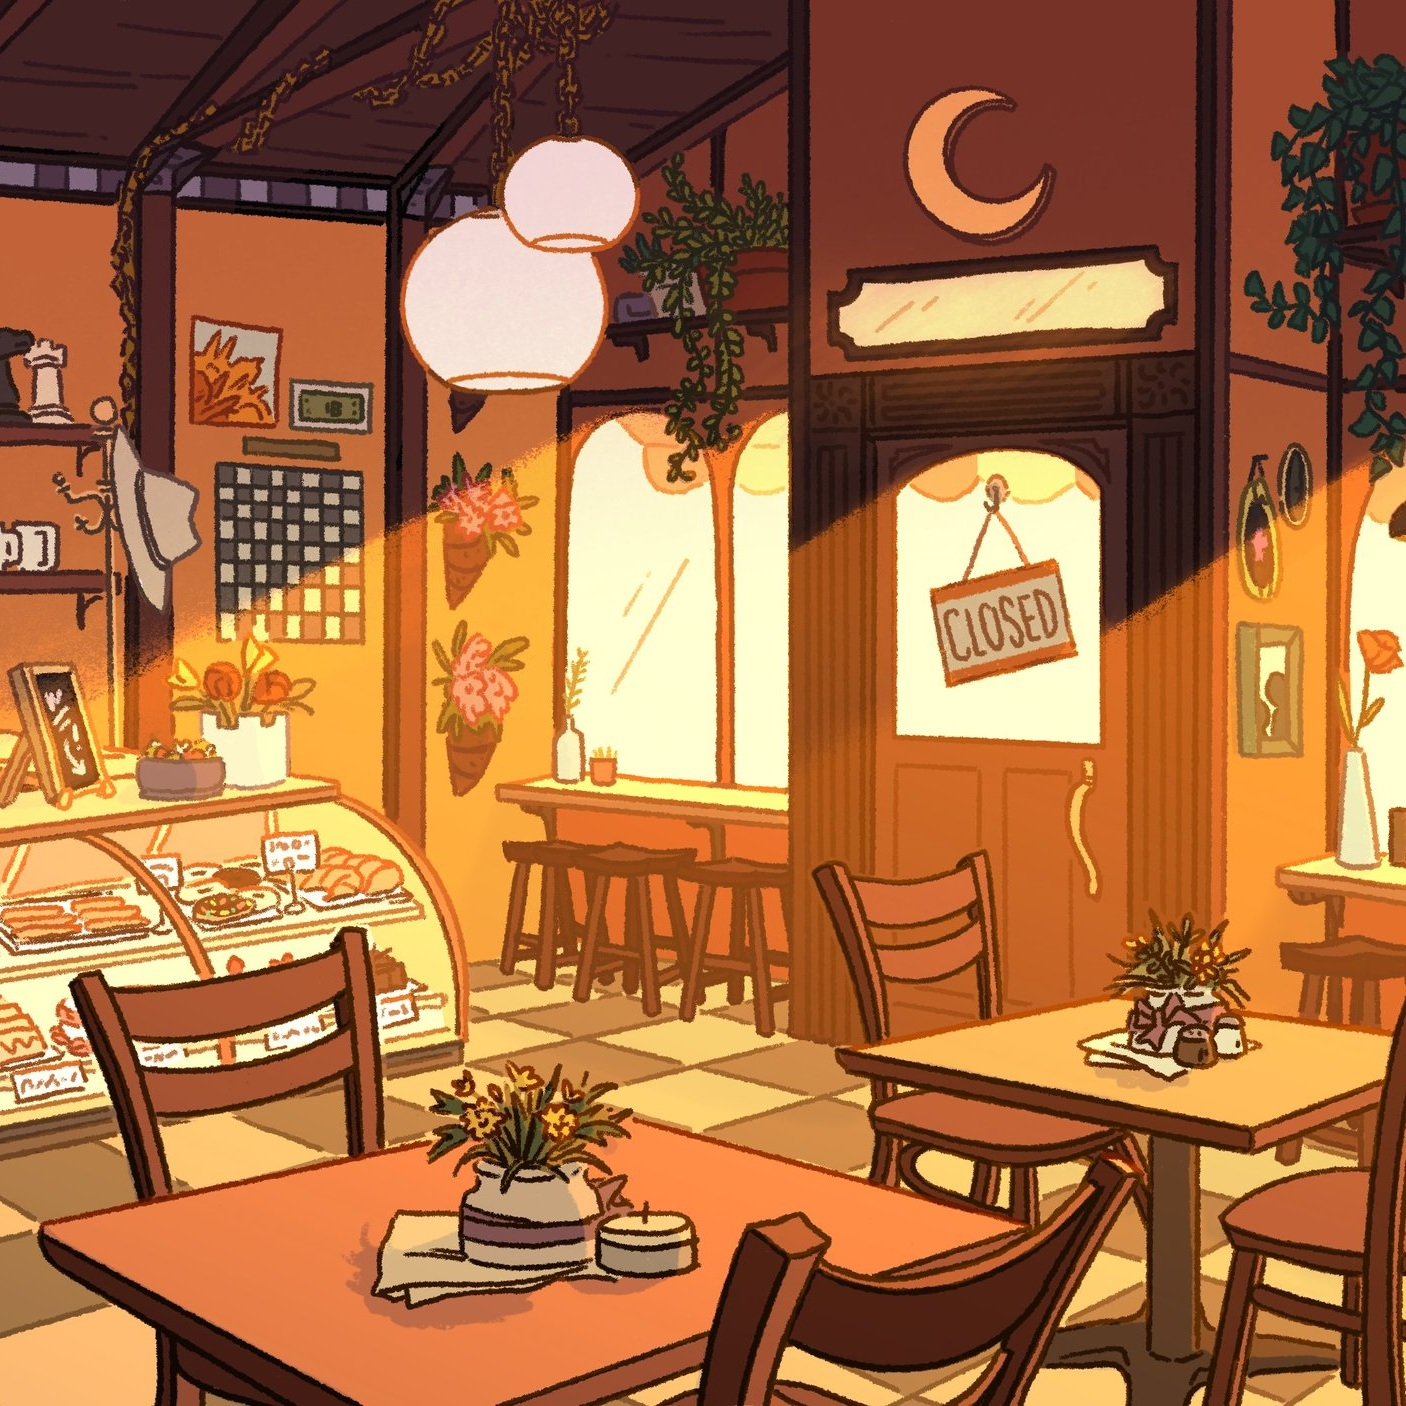 epibg_cafe_color.jpg